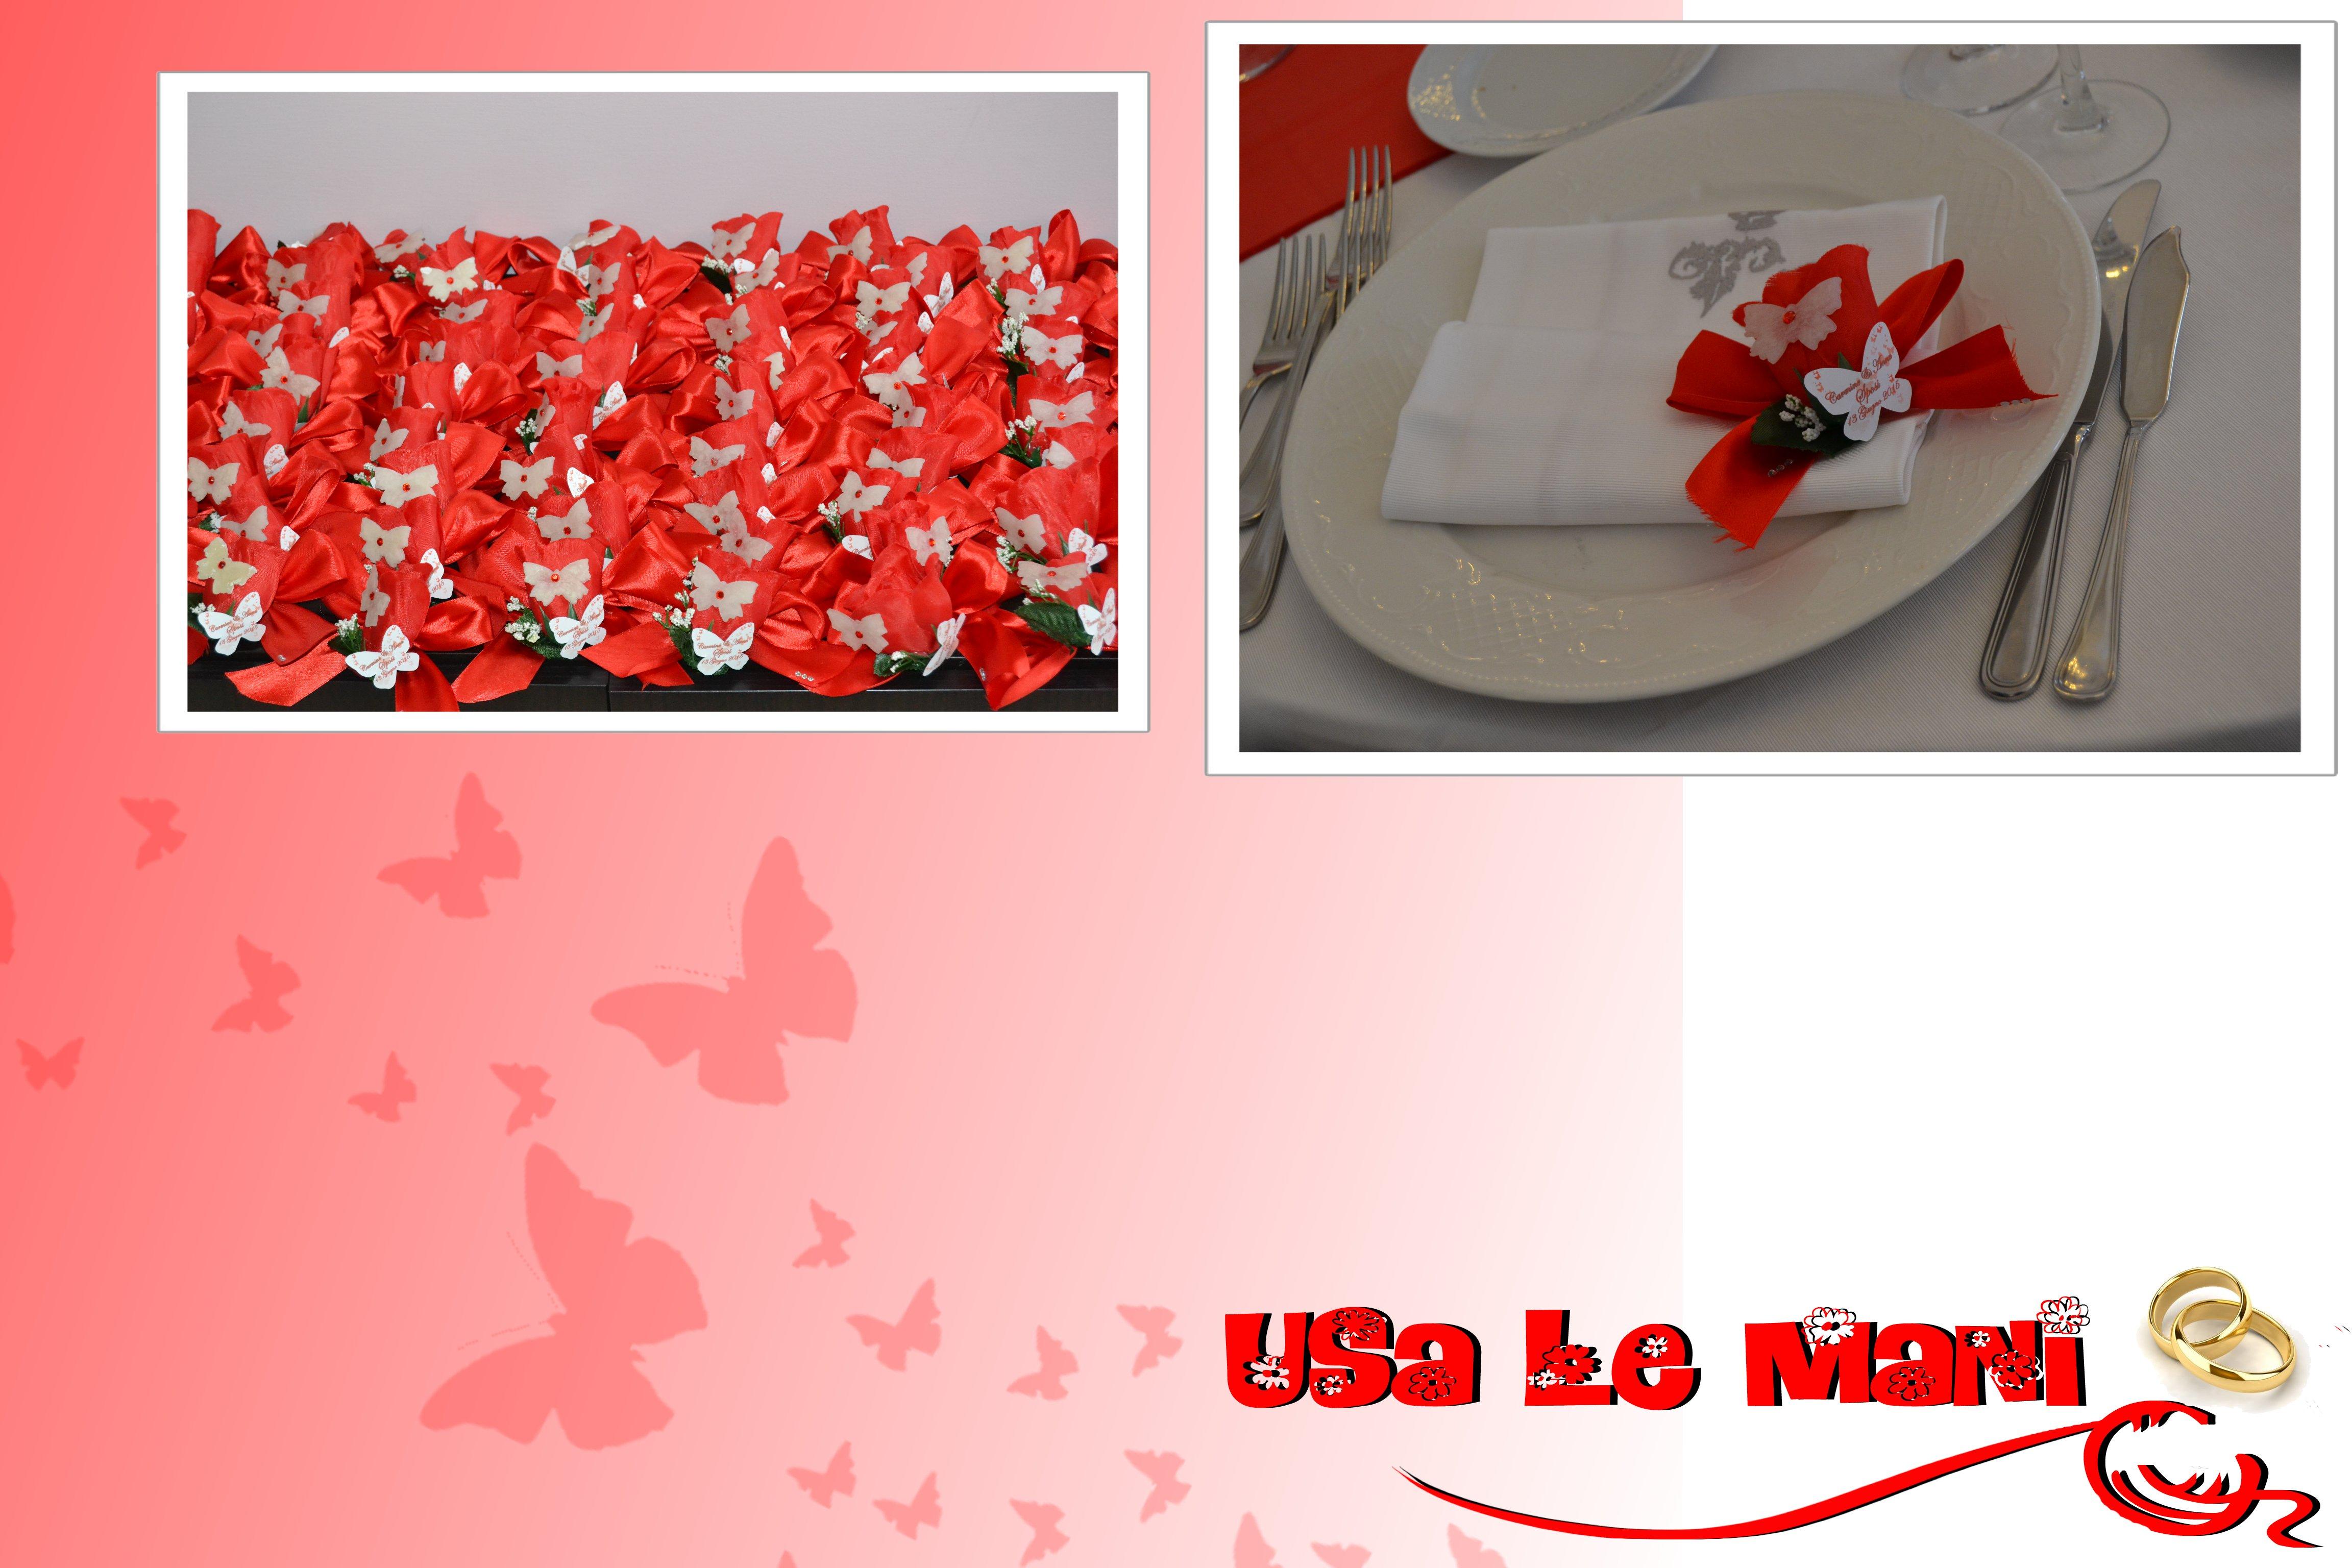 Farfalle Fai Da Te matrimonio tema farfalle colore rosso - usa le mani